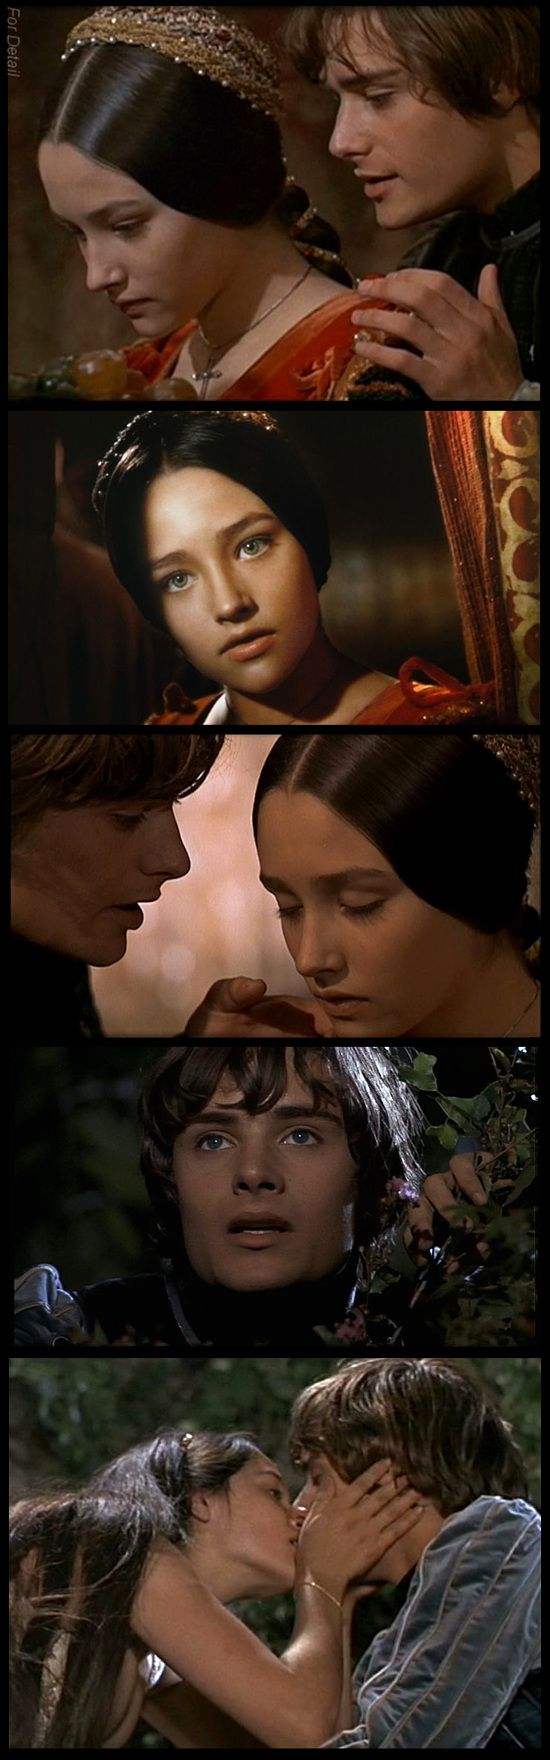 Romeo and Juliet (1968) - Stars: Leonard Whiting, Olivia Hussey -  Director: Franco Zeffirelli